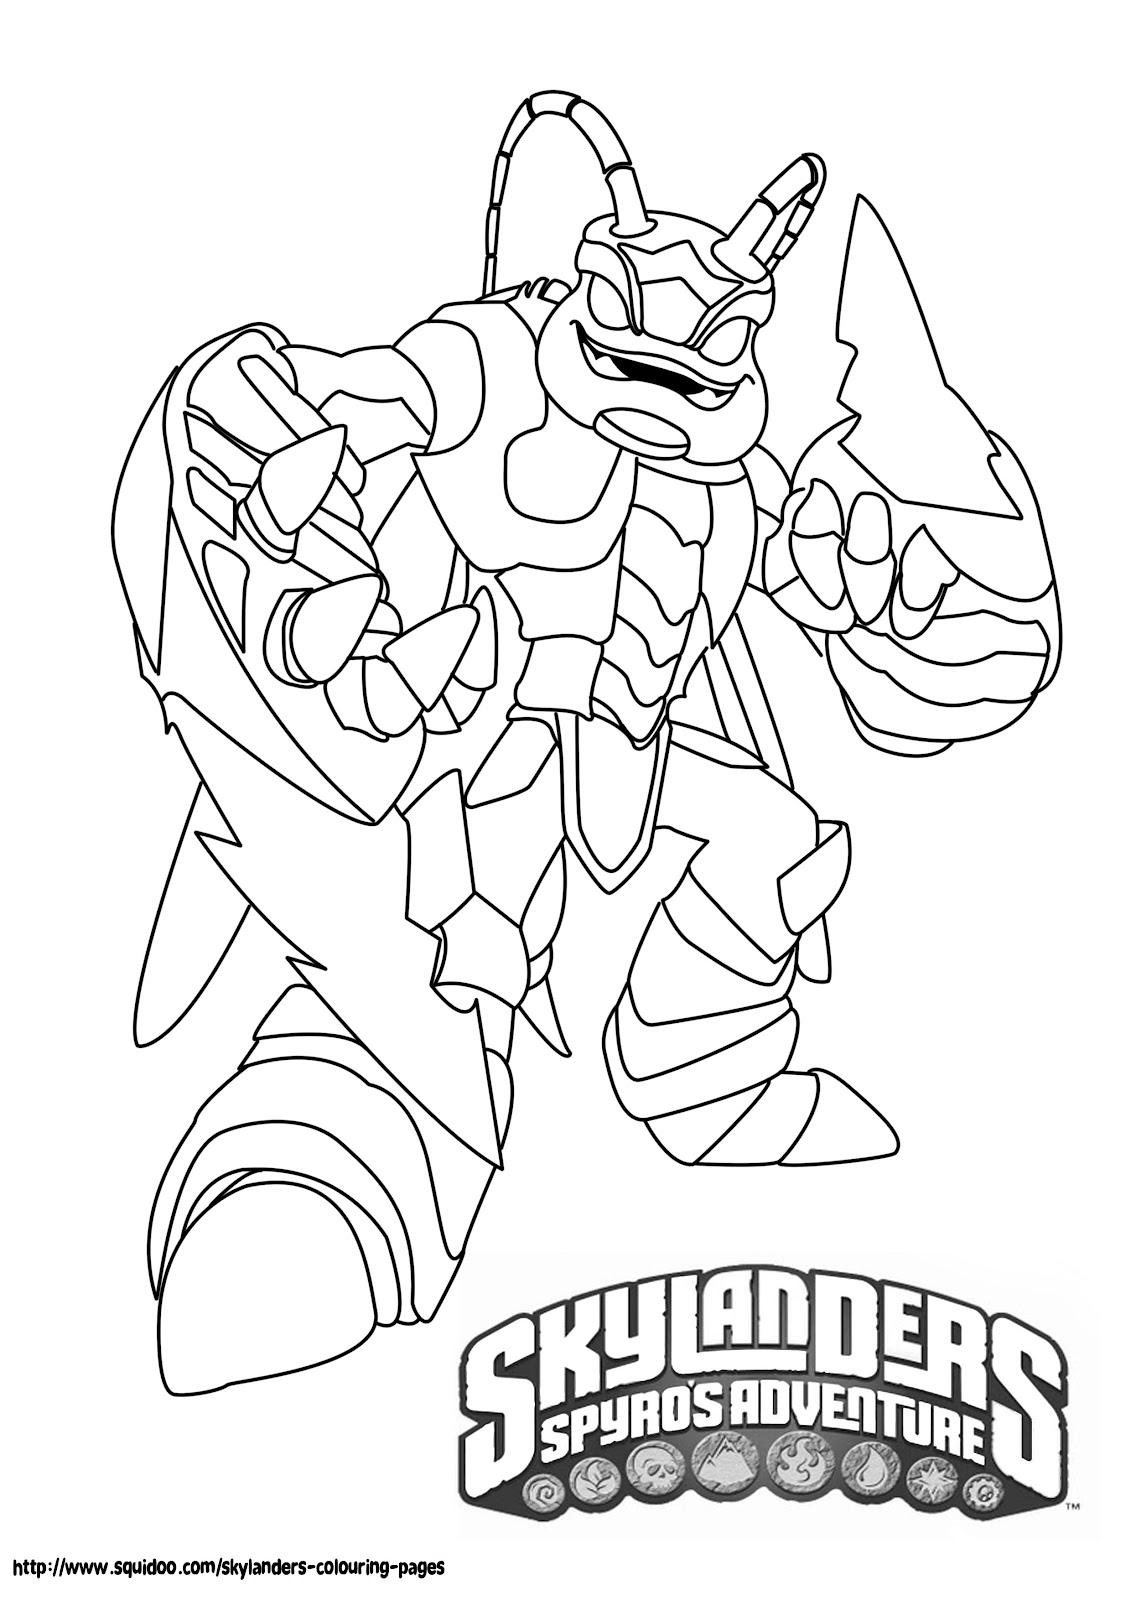 skylanders colouring pages online printable skylanders coloring pages pages colouring skylanders online